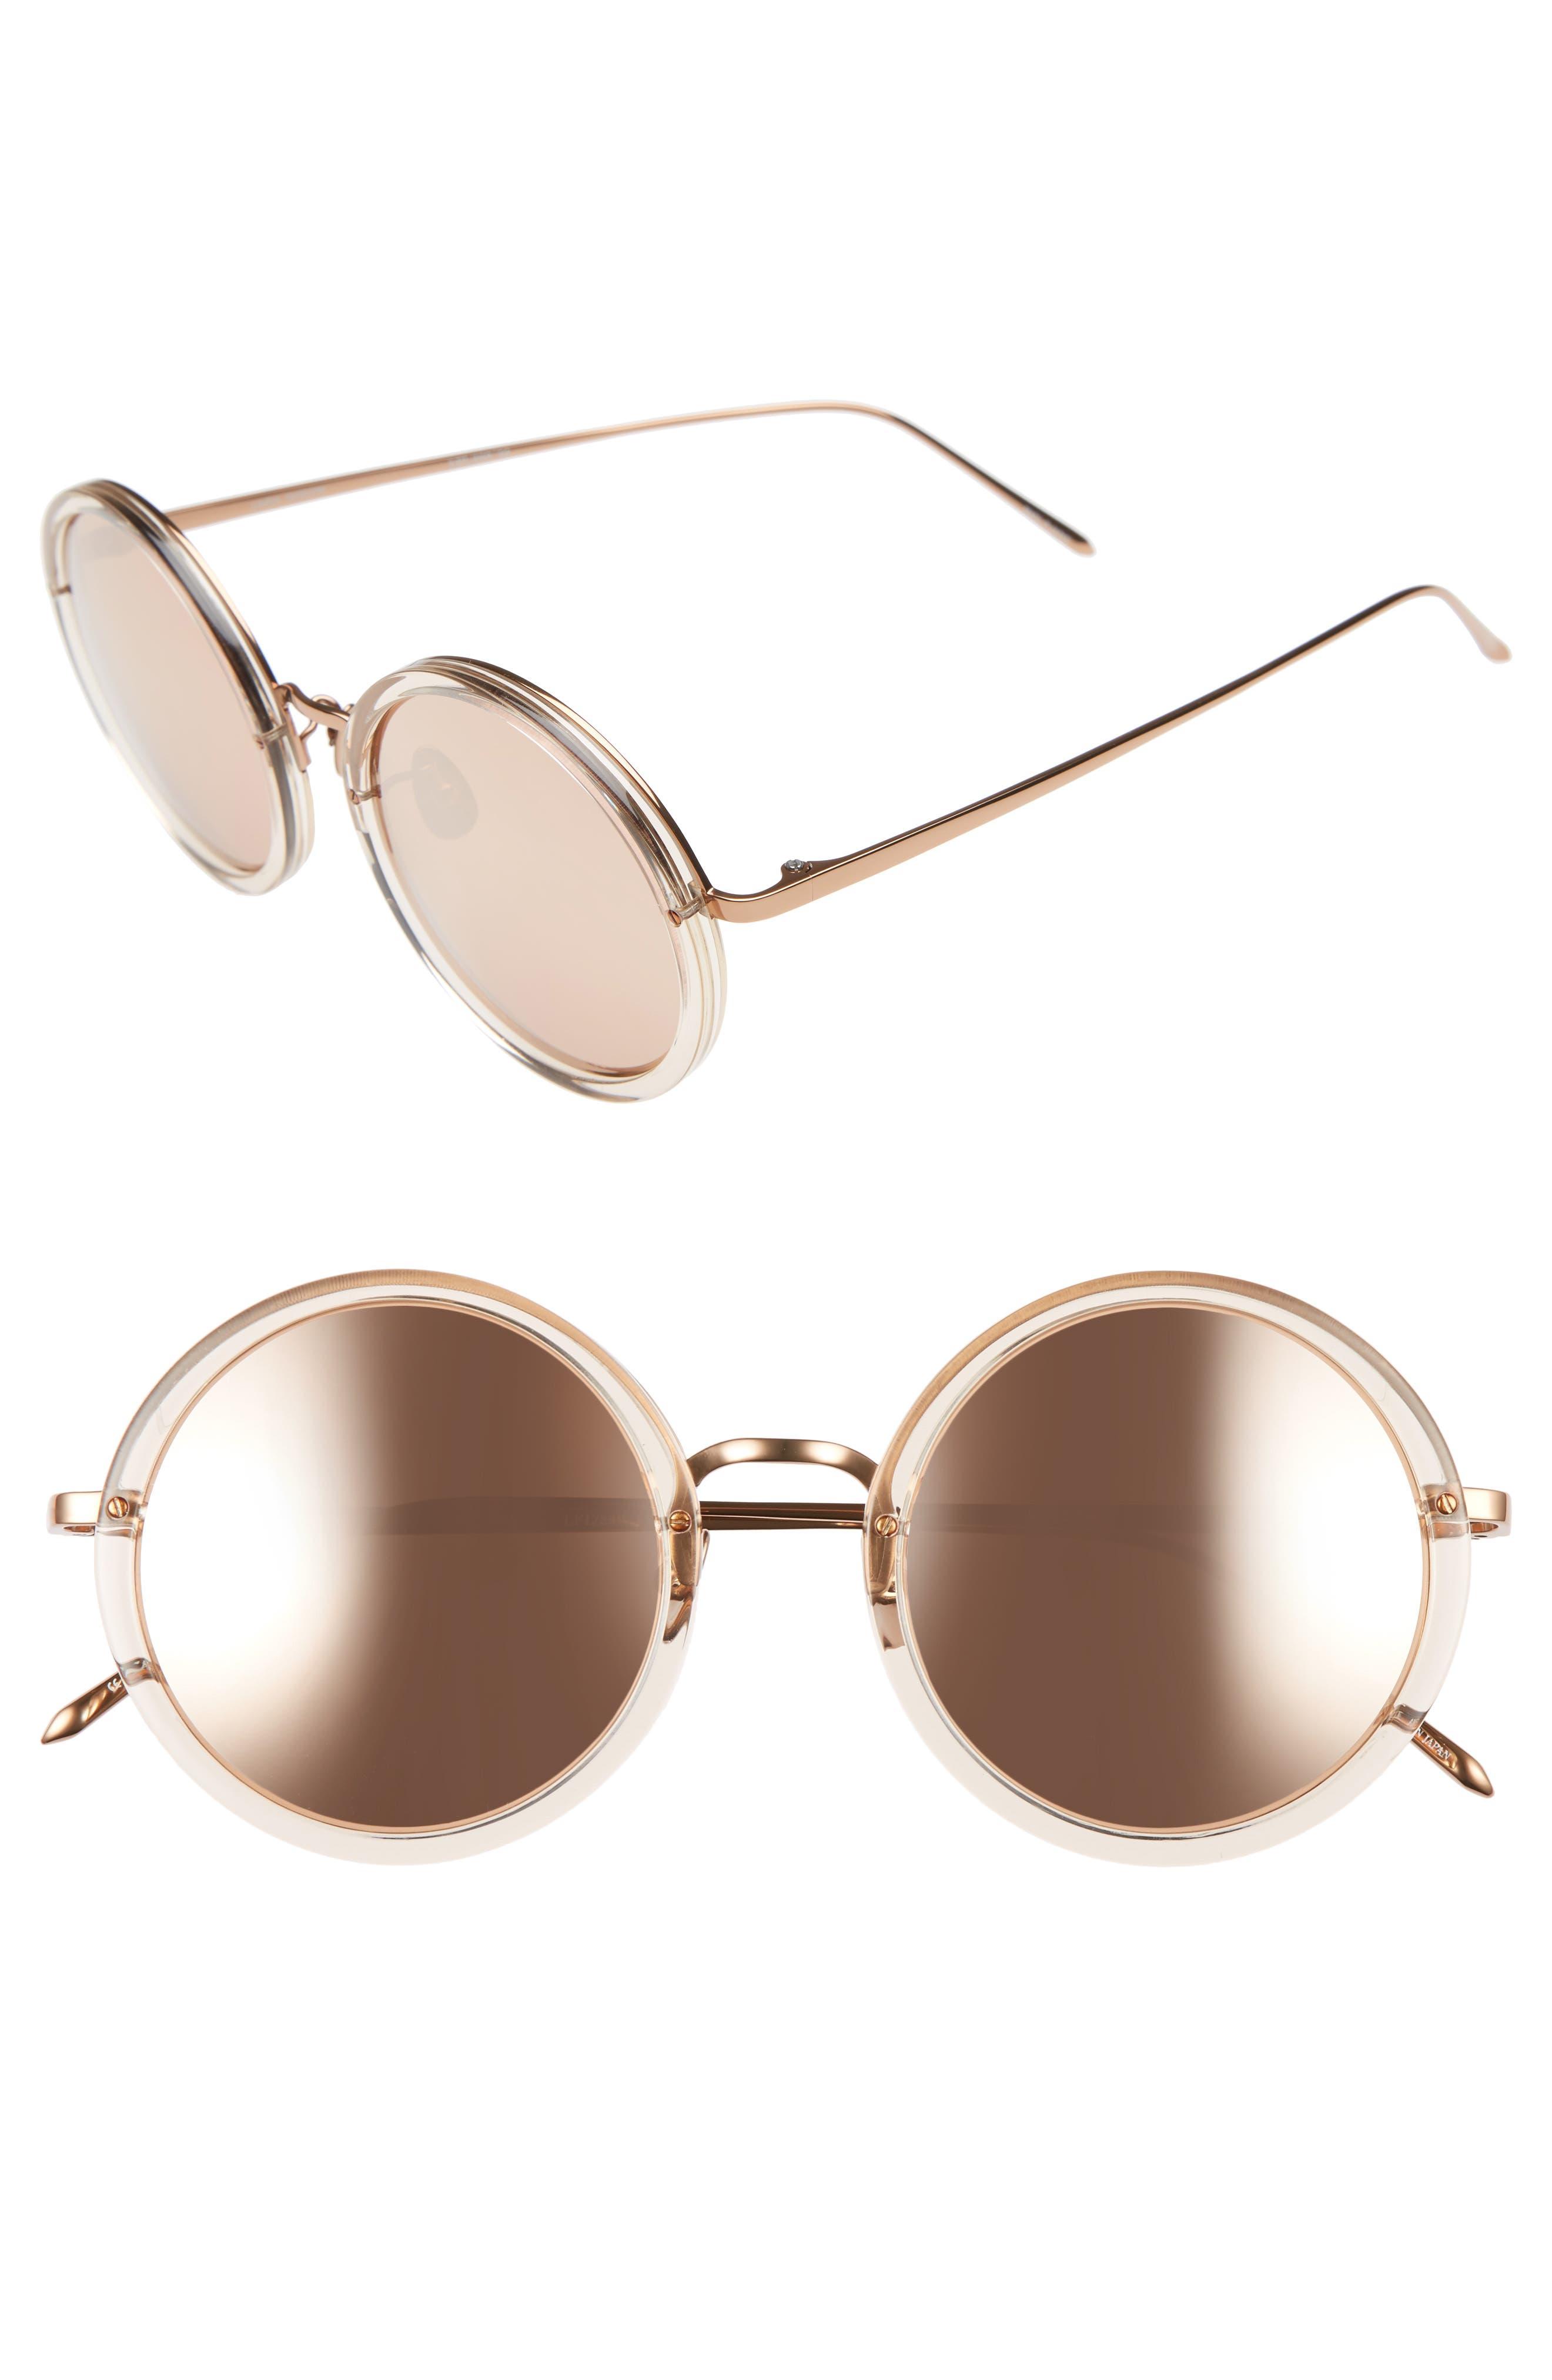 Main Image - Linda Farrow 51mm Round Sunglasses